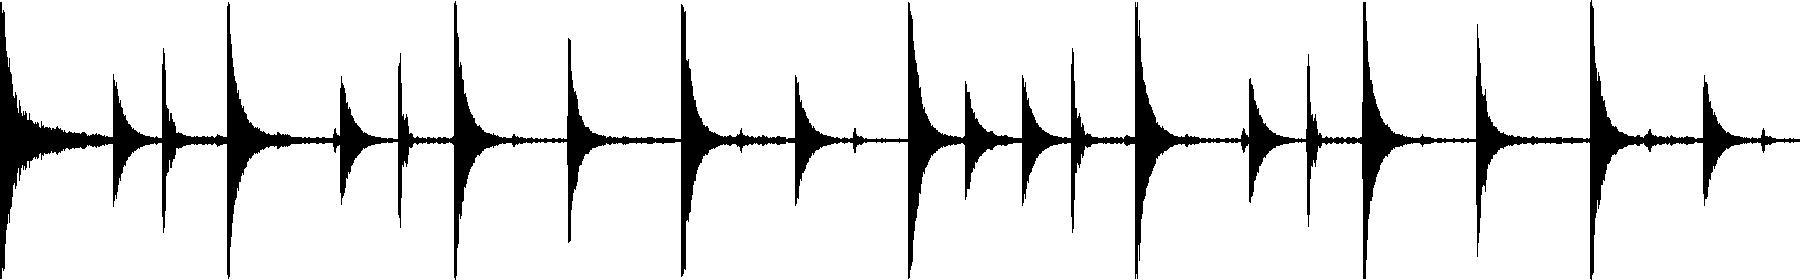 shg percussion loop 16